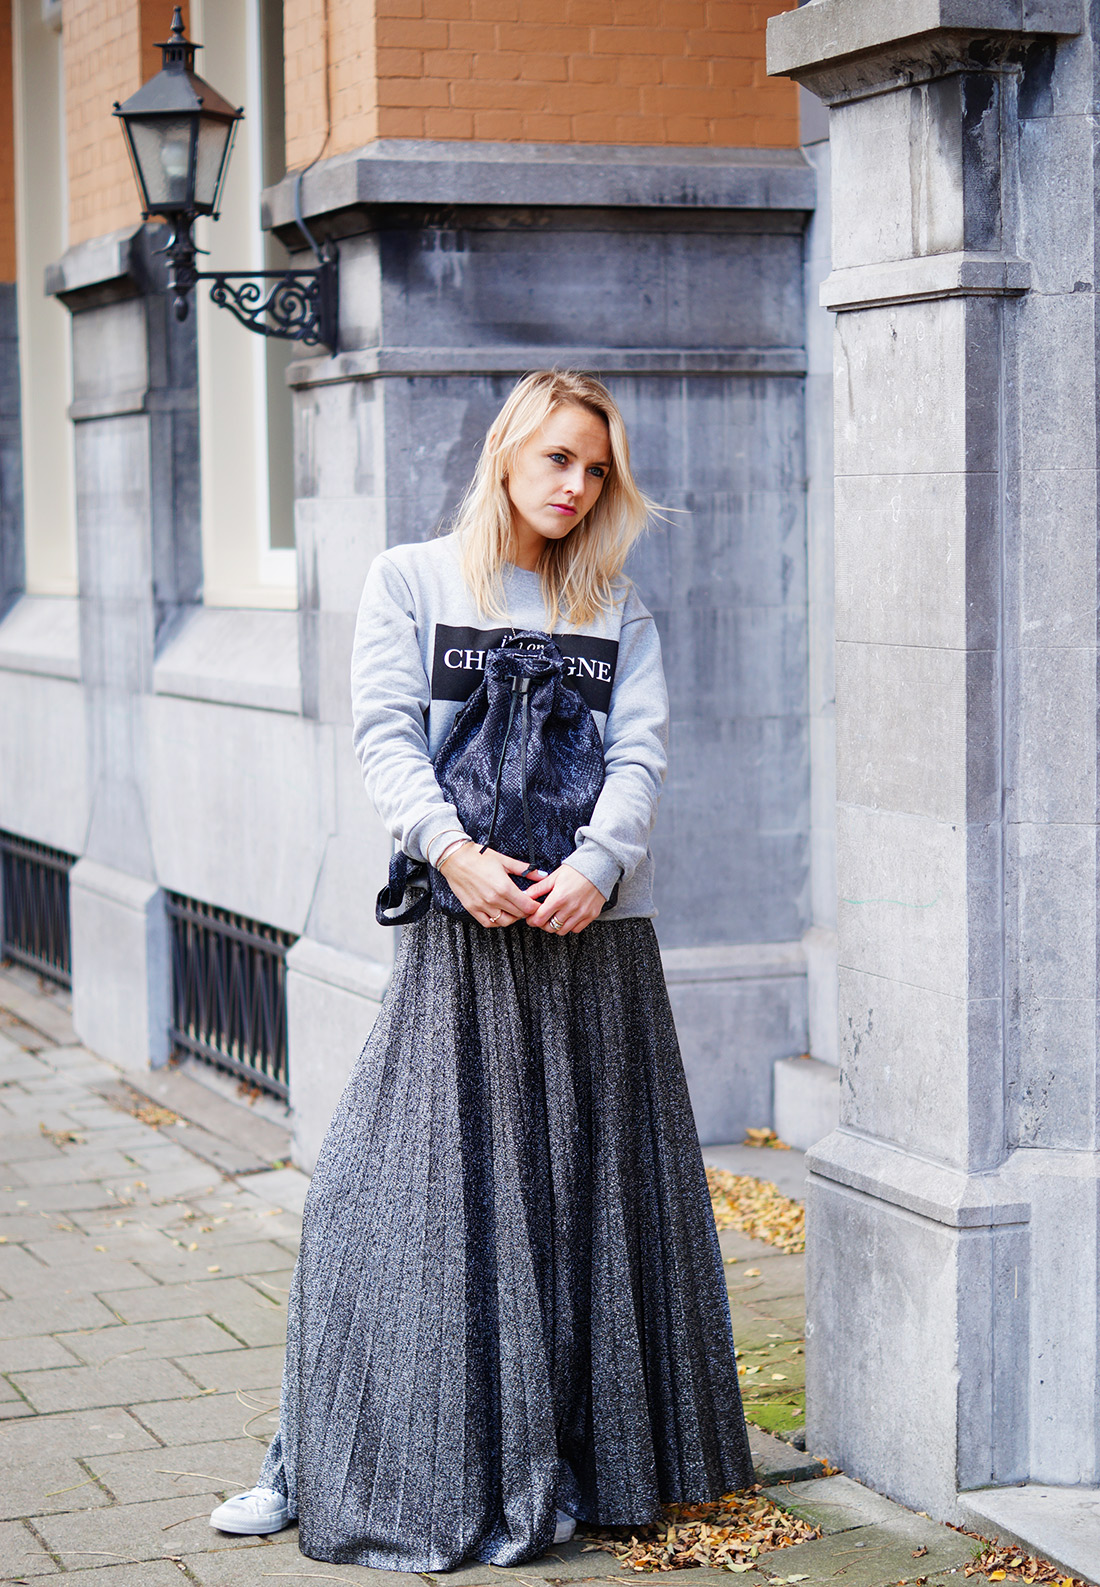 Bag-at-you---Fashion-blog---Herschel-Hanson-Bag---Grey-outfit